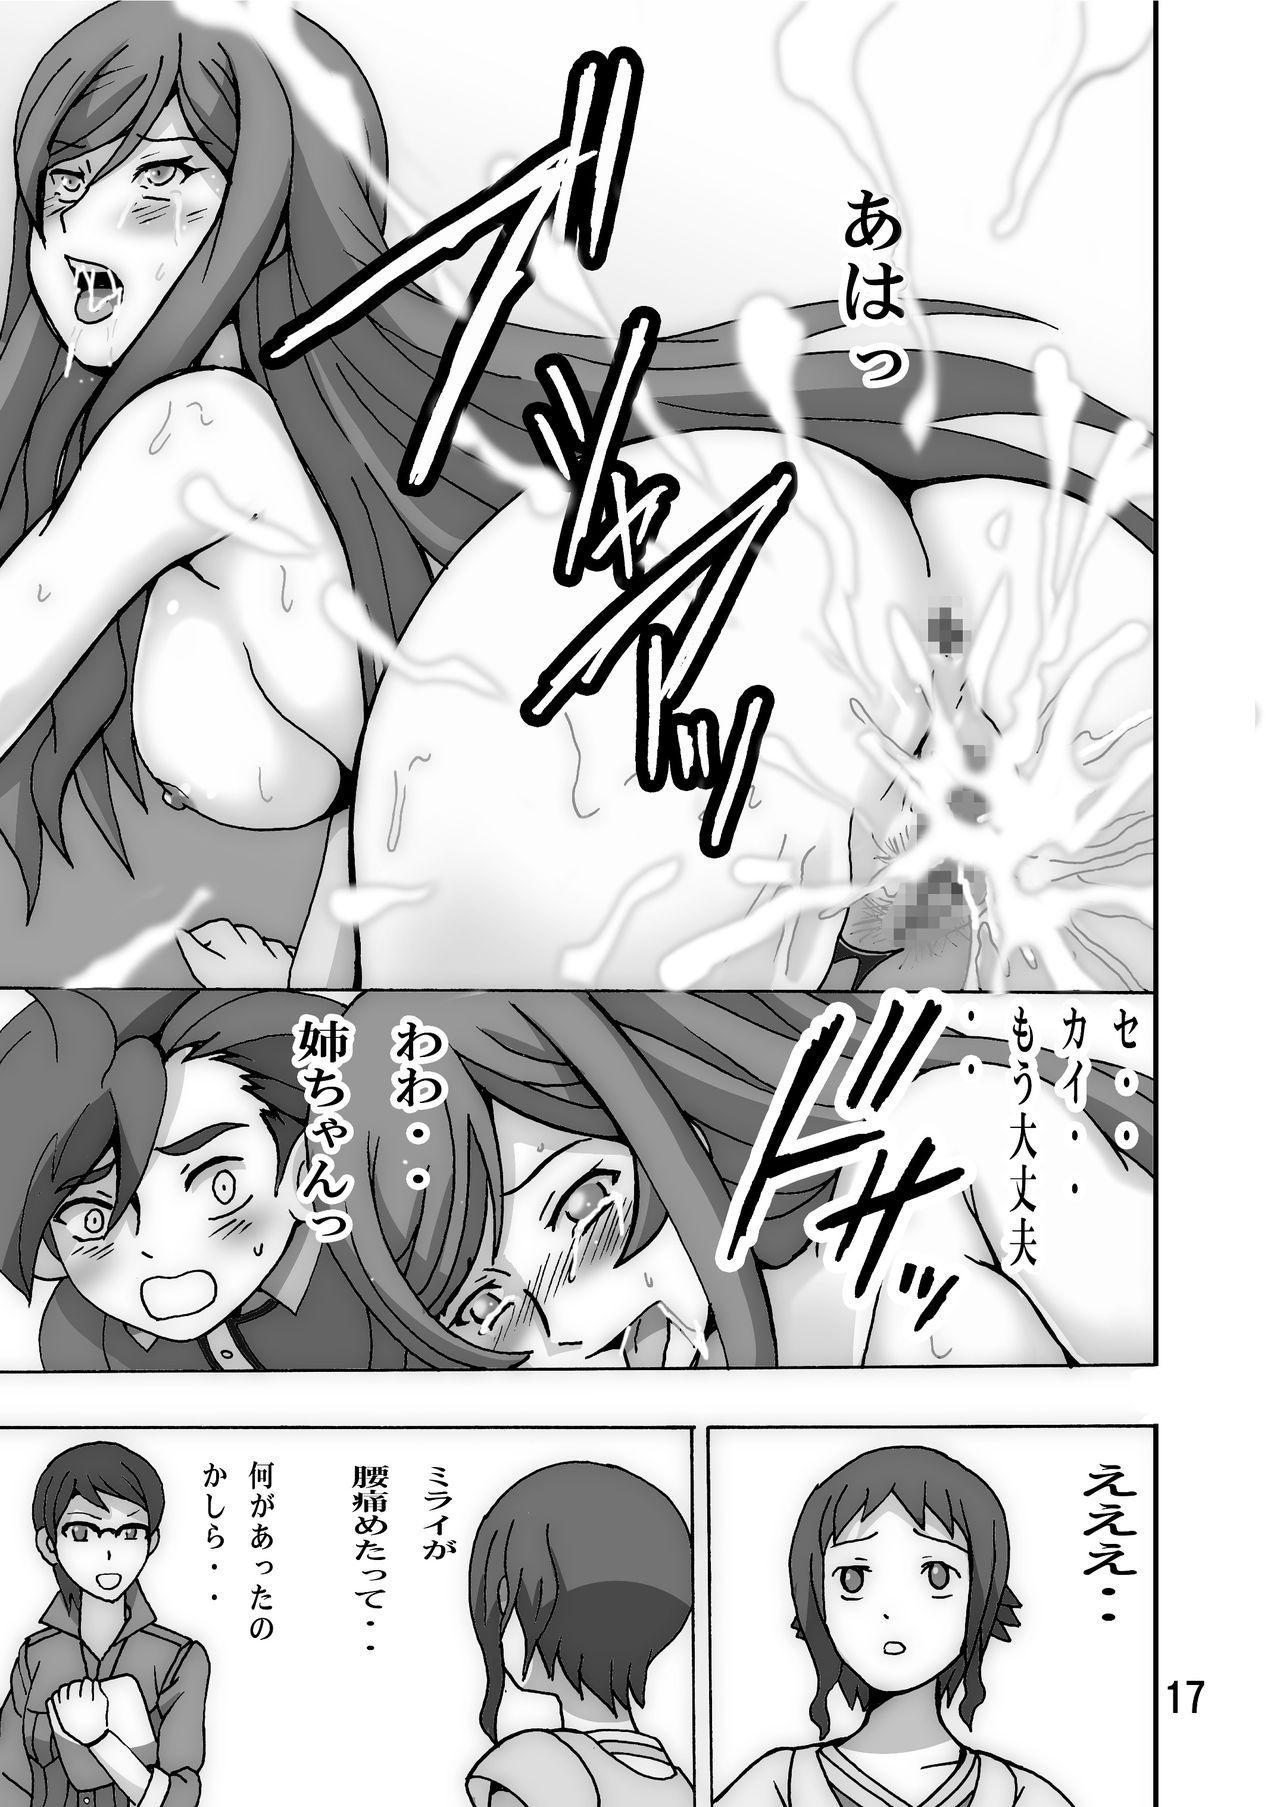 Ganbare! Onee-chan 16